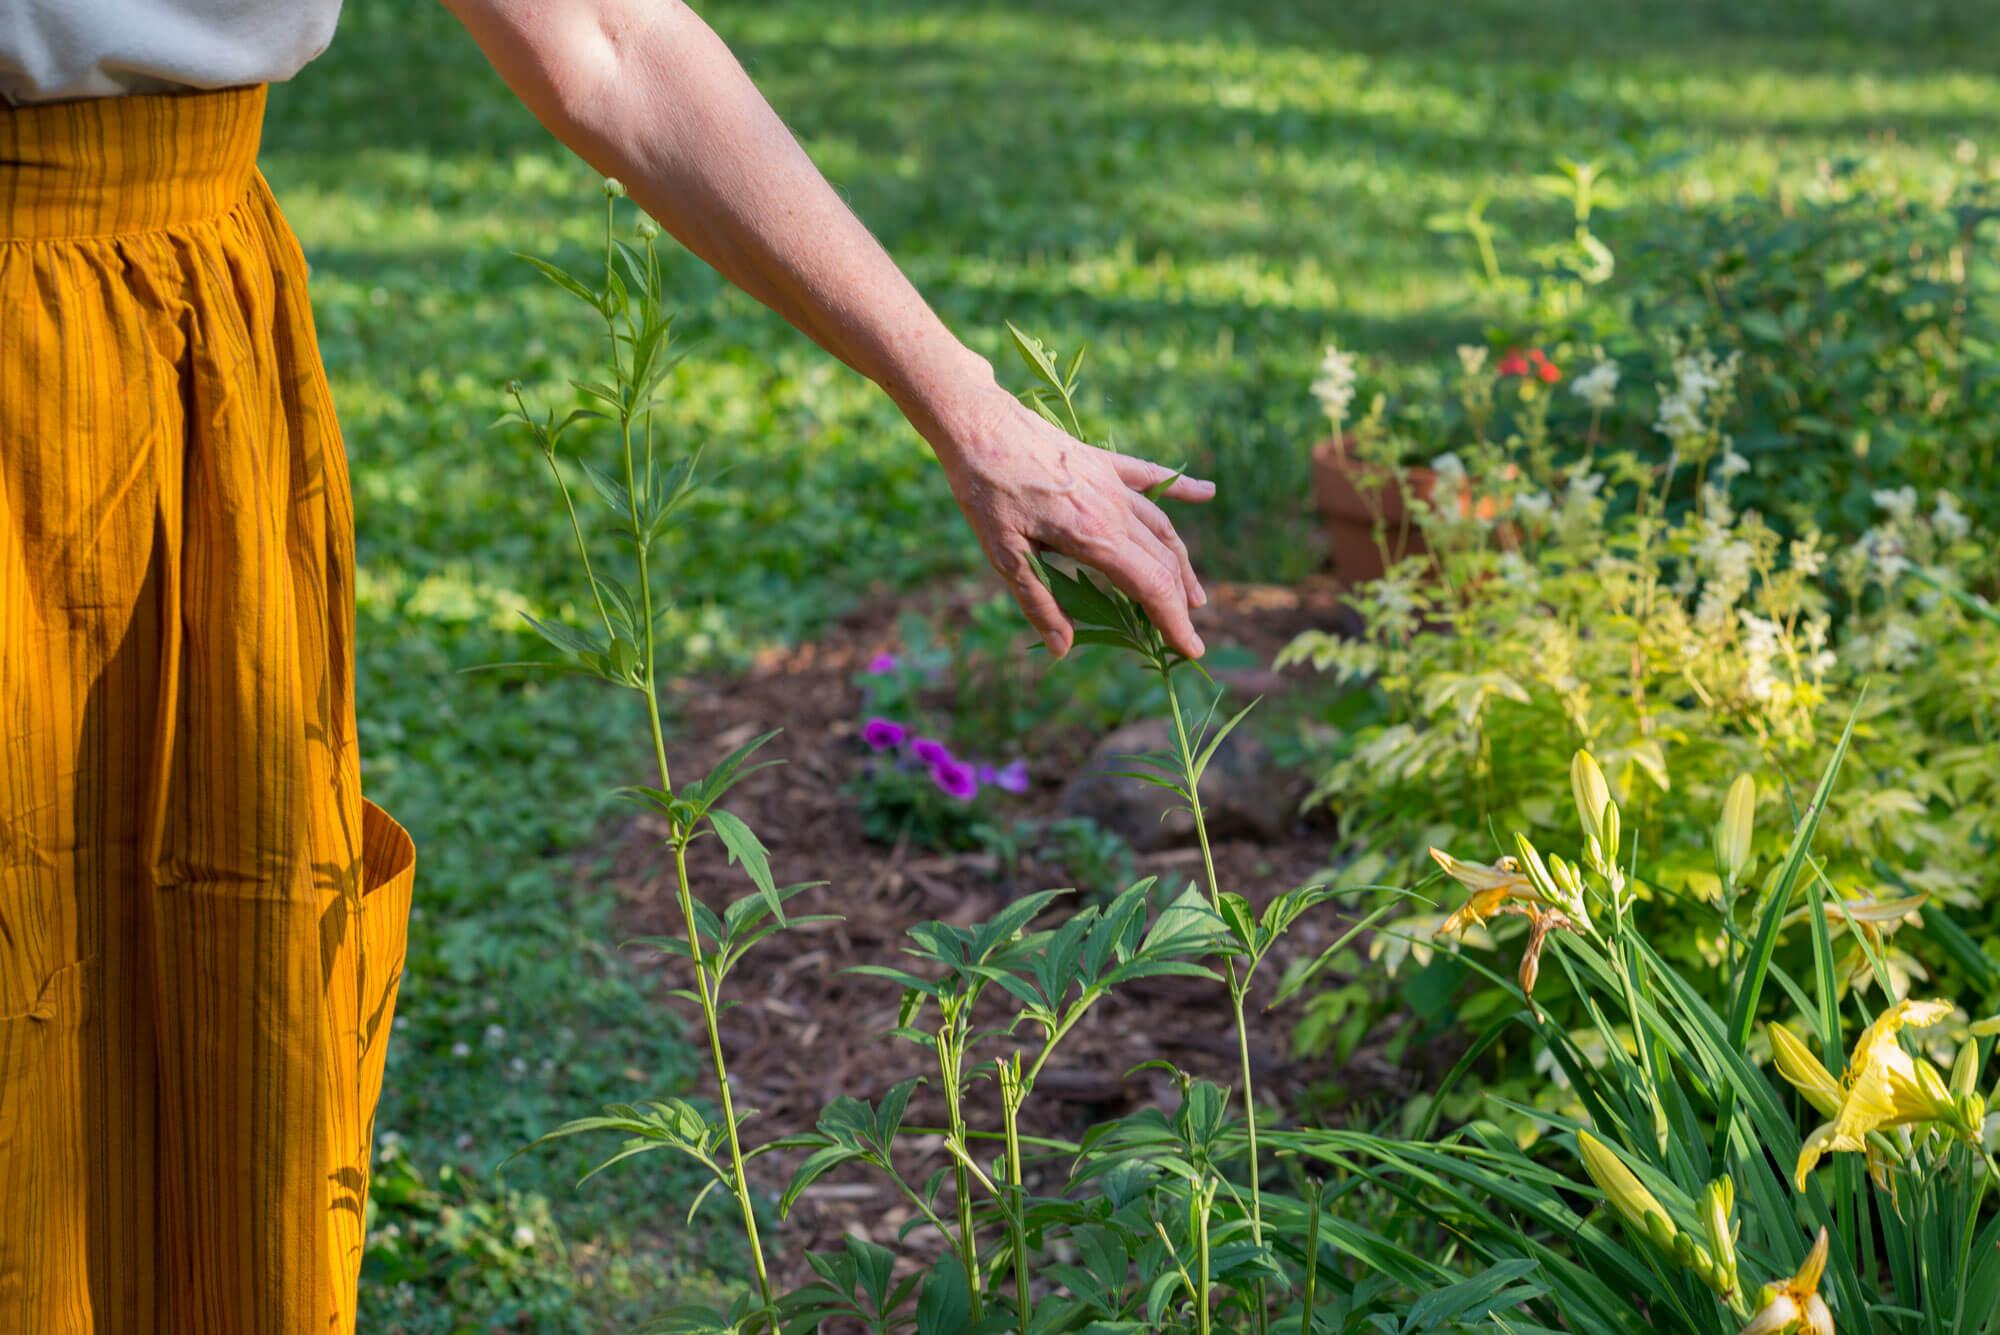 JosieLaura 2020 036 - A Walk in the Garden